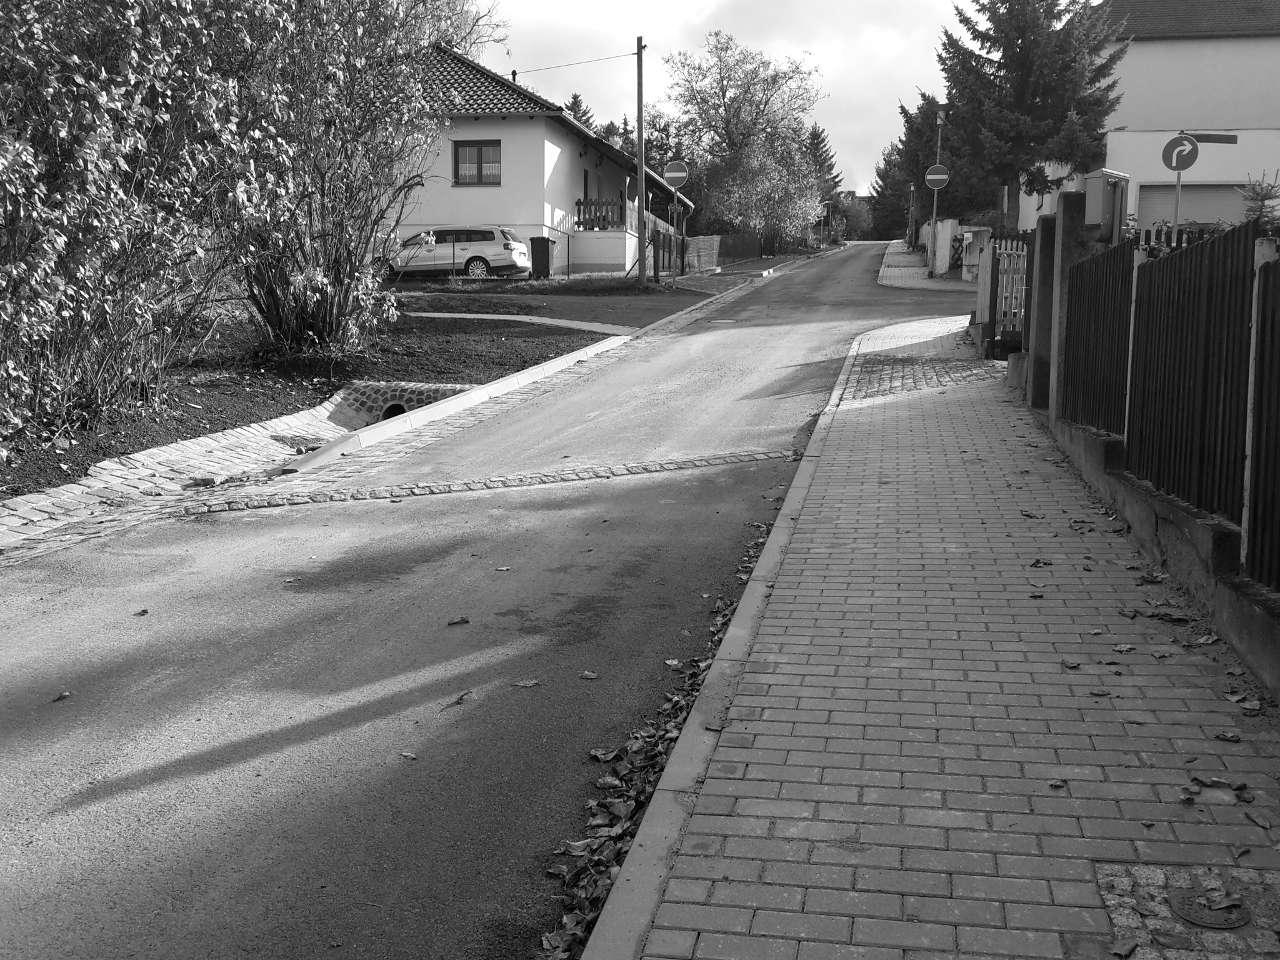 Apolda, OT Oberroßla – An der Ringpromenade